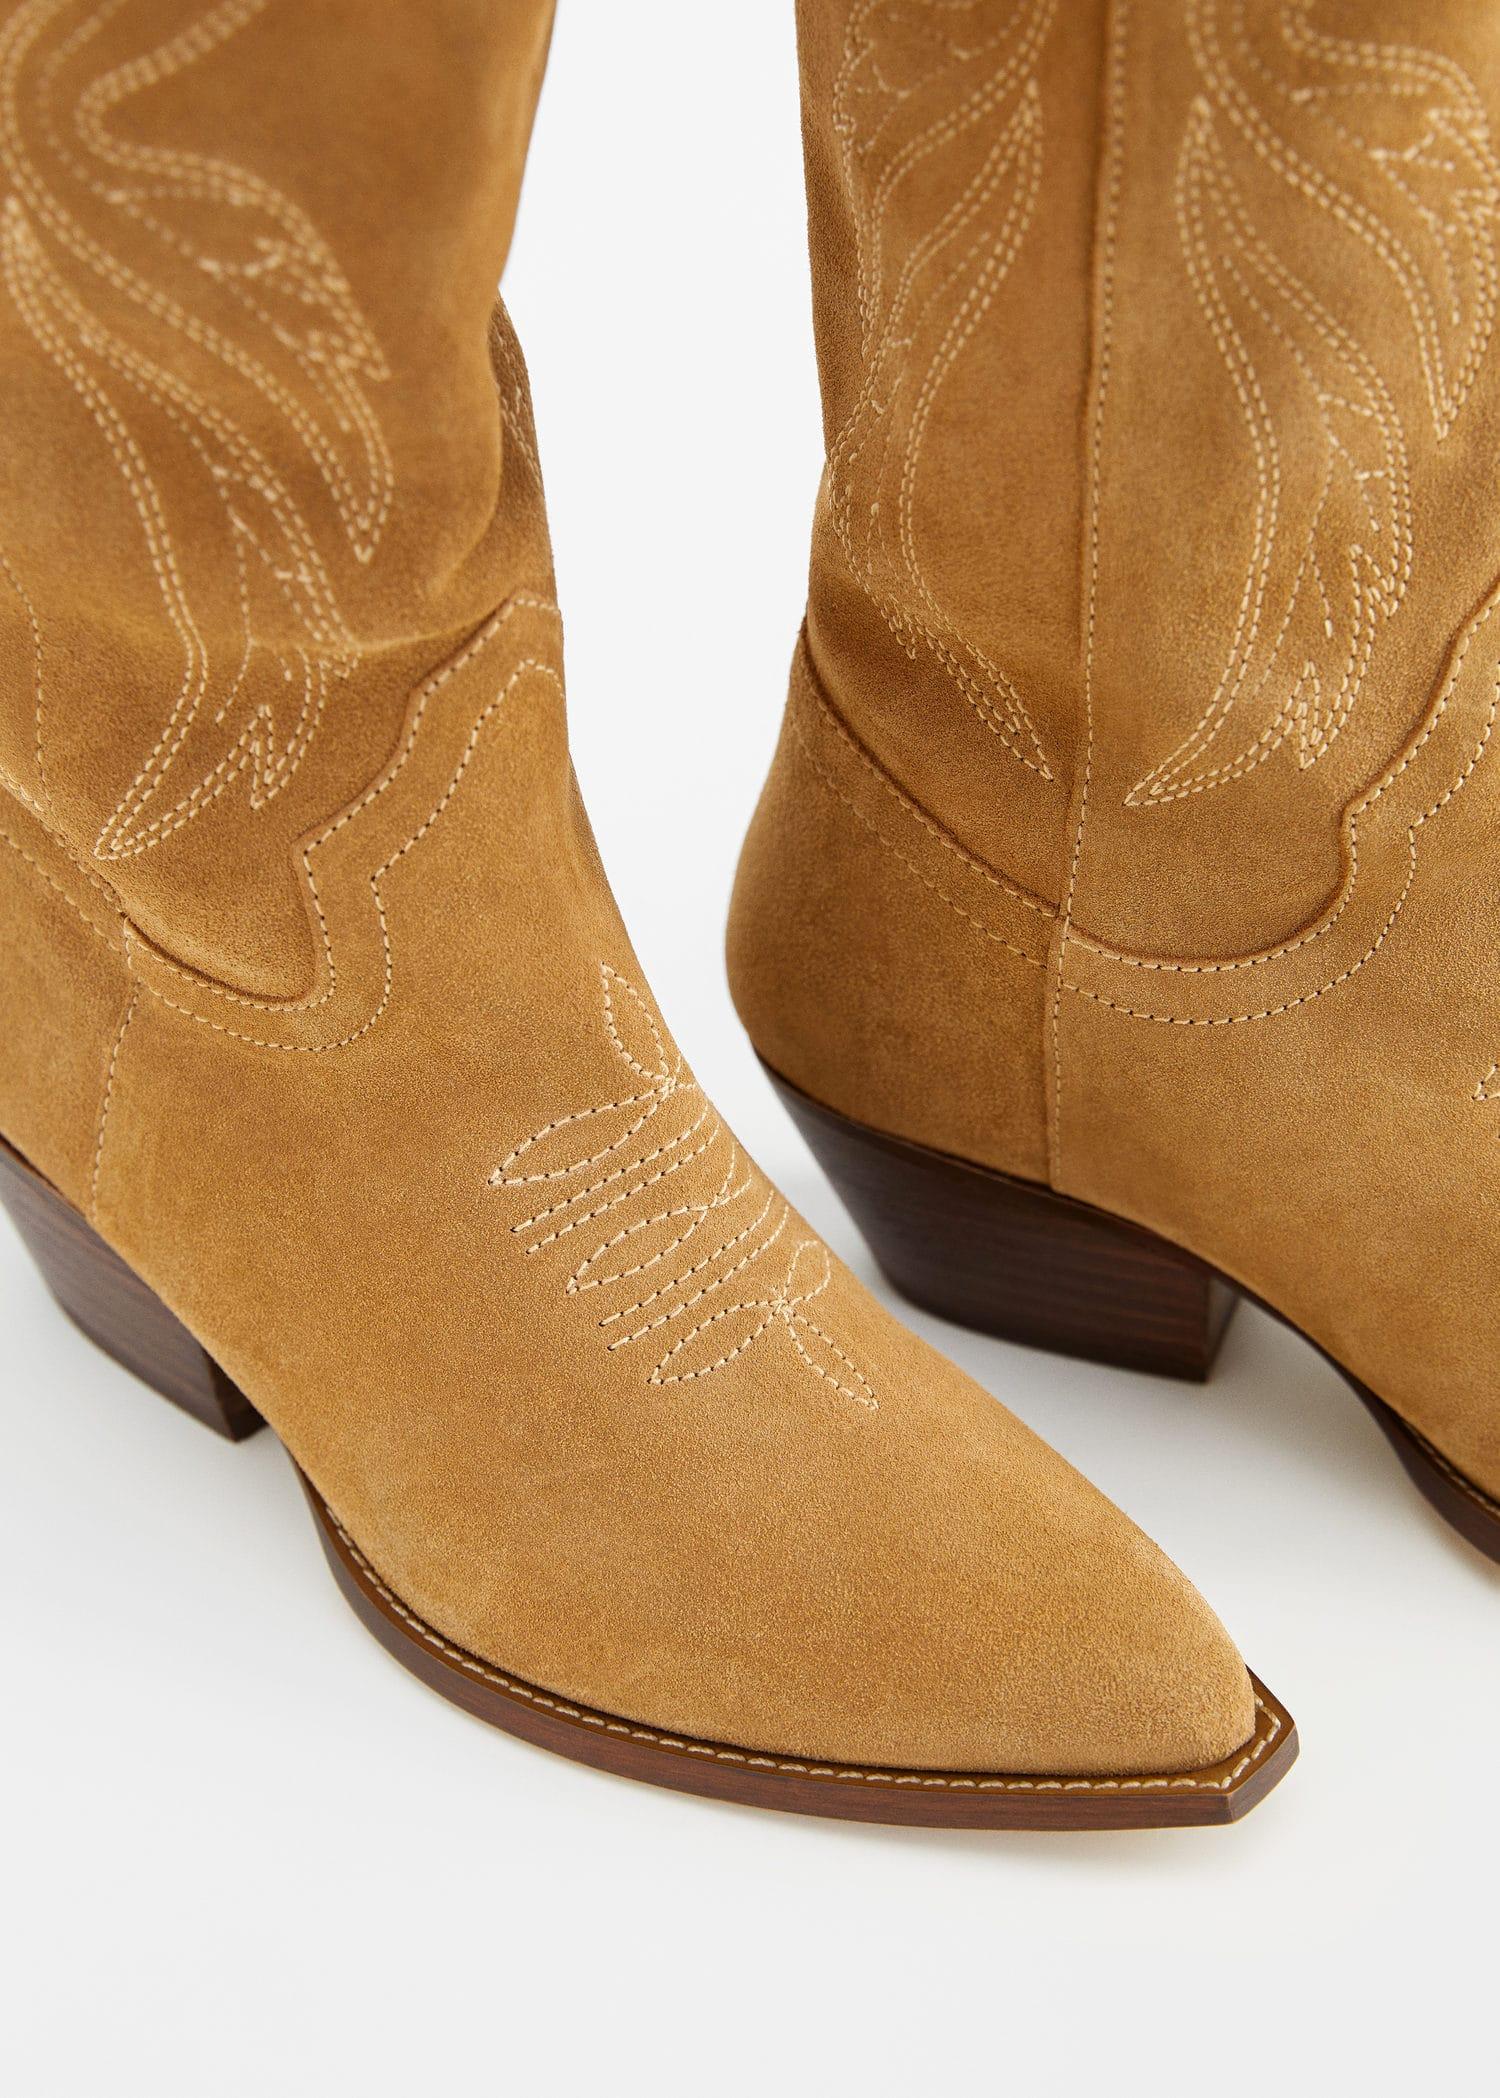 Bota piel cowboy Tallas grandes   Violeta by MNG Panamá